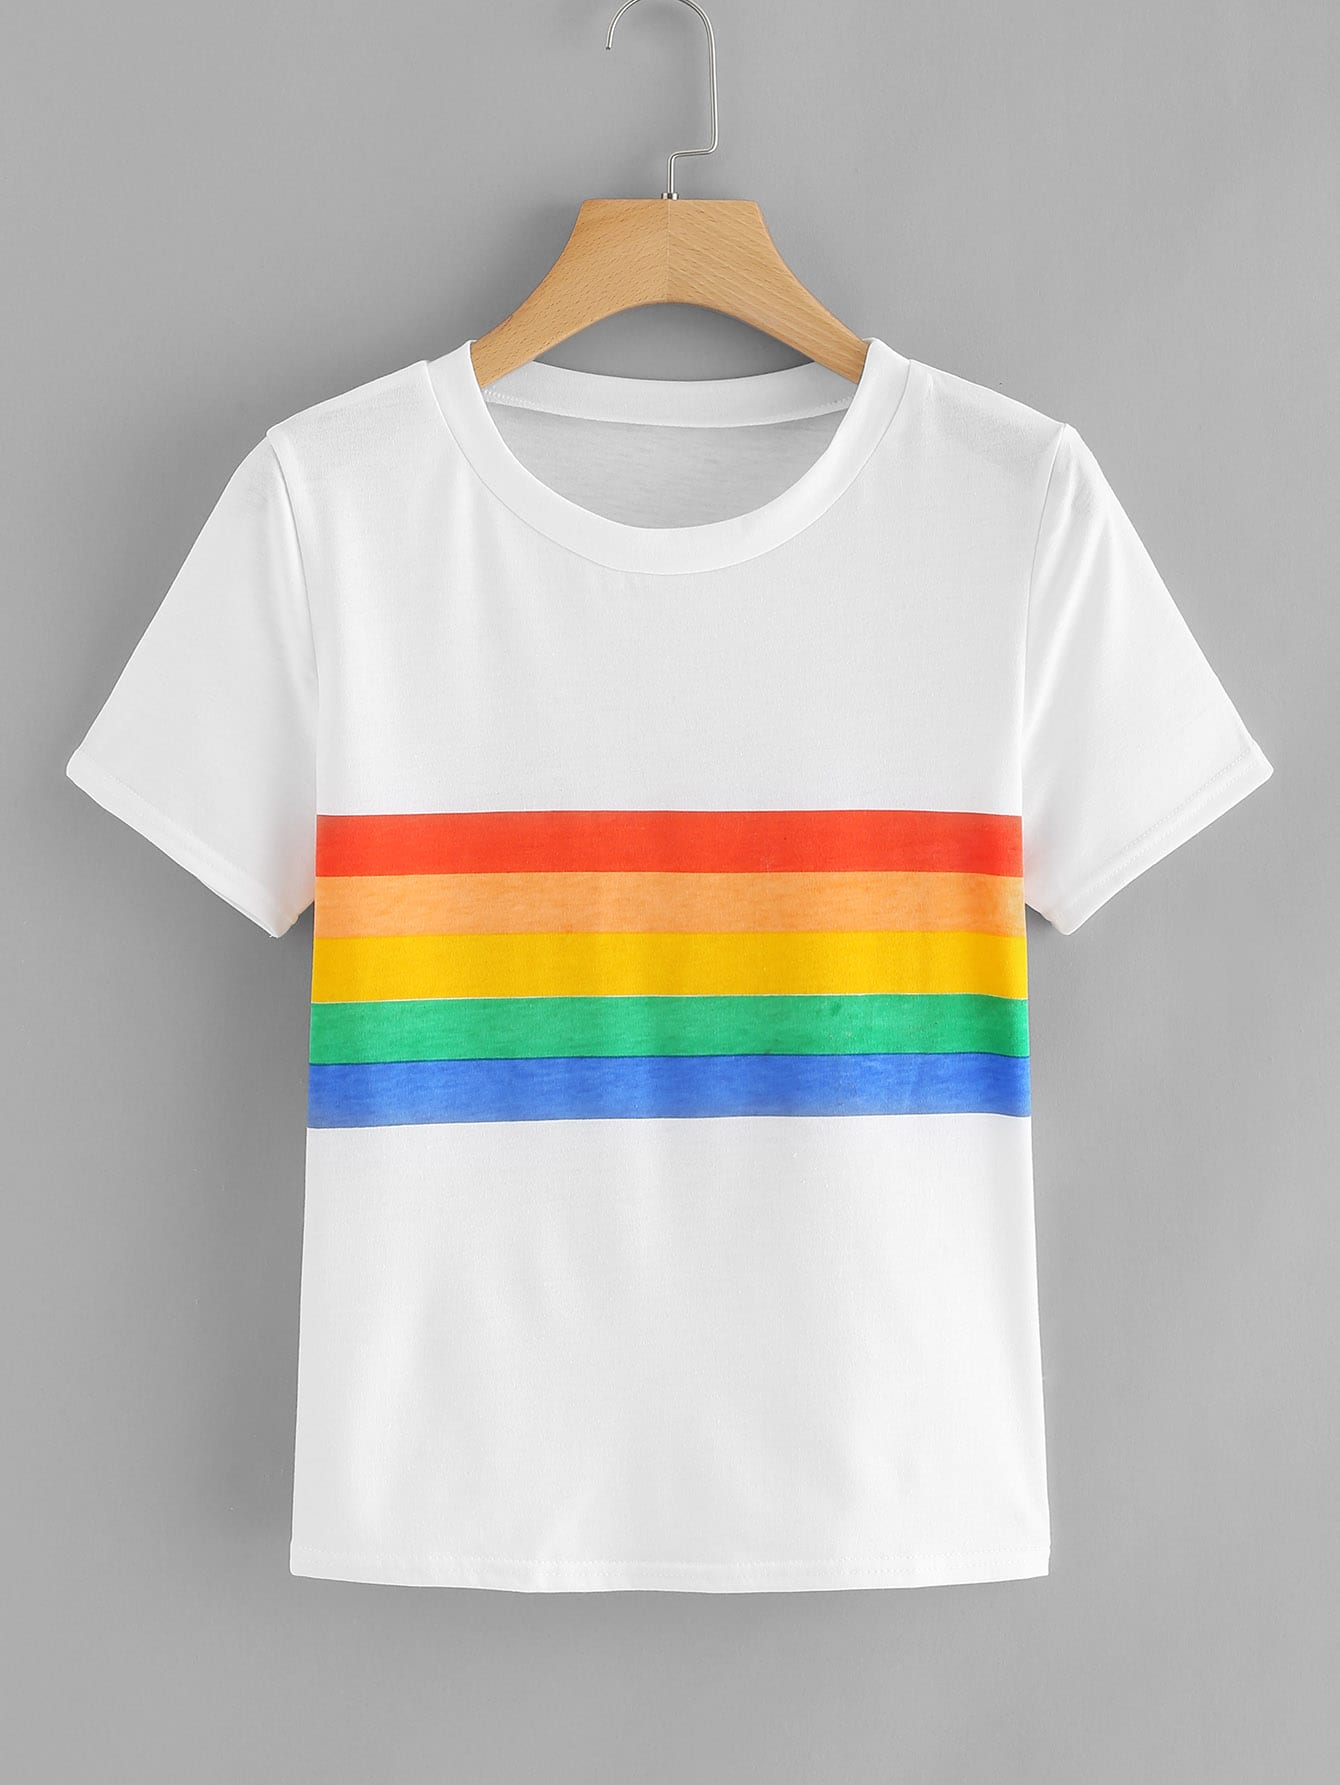 Contrast Rainbow Striped Tee men rainbow striped tee